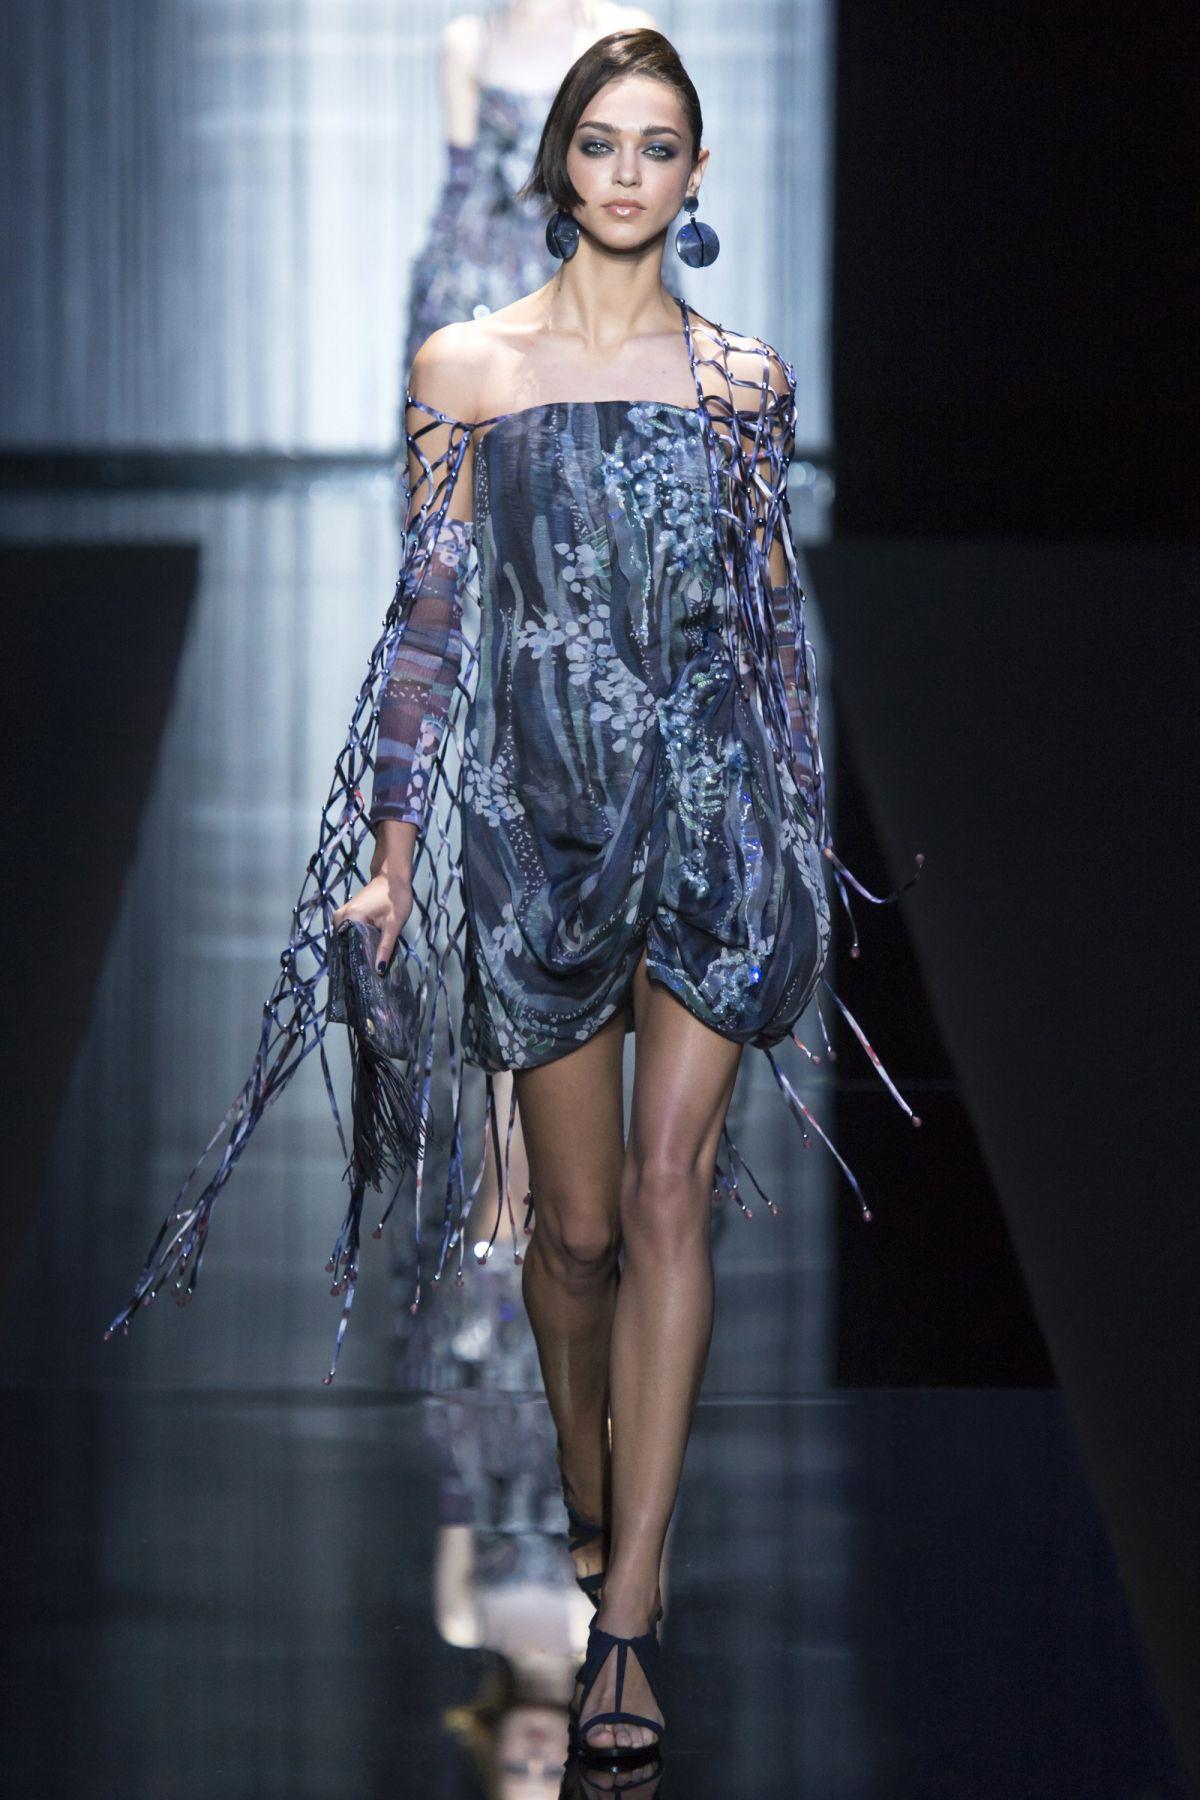 ZENYA KATAVA at Giorgio Armani Spring/Summer 2017 Fashion Show at Milan Fashion Week